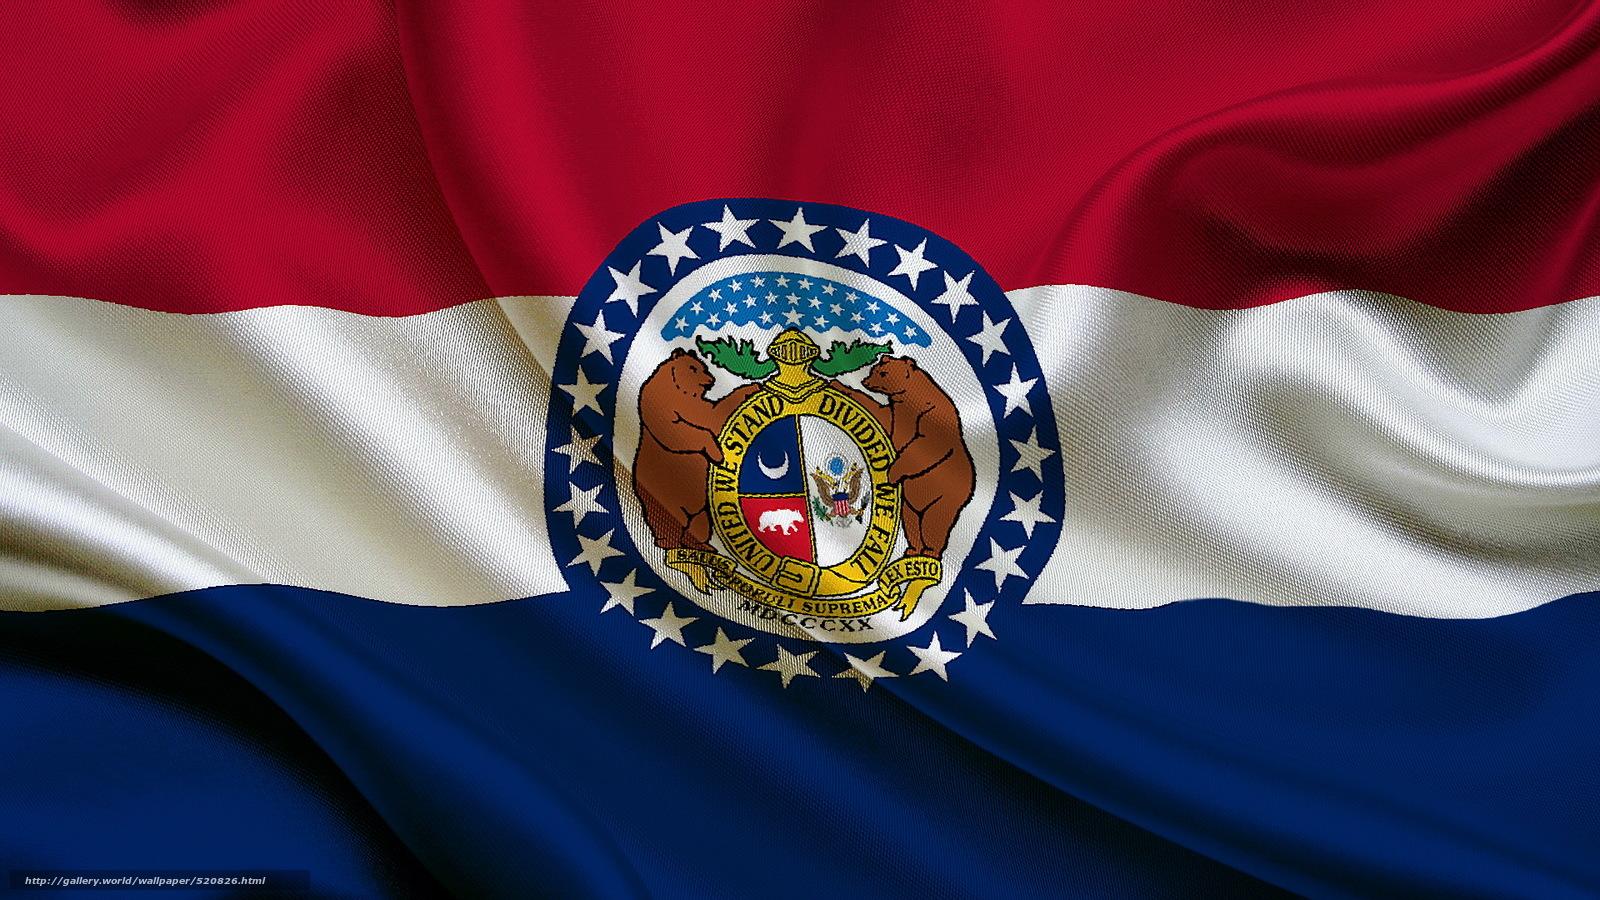 Download wallpaper flag State Missouri state flag of missouri 1600x900